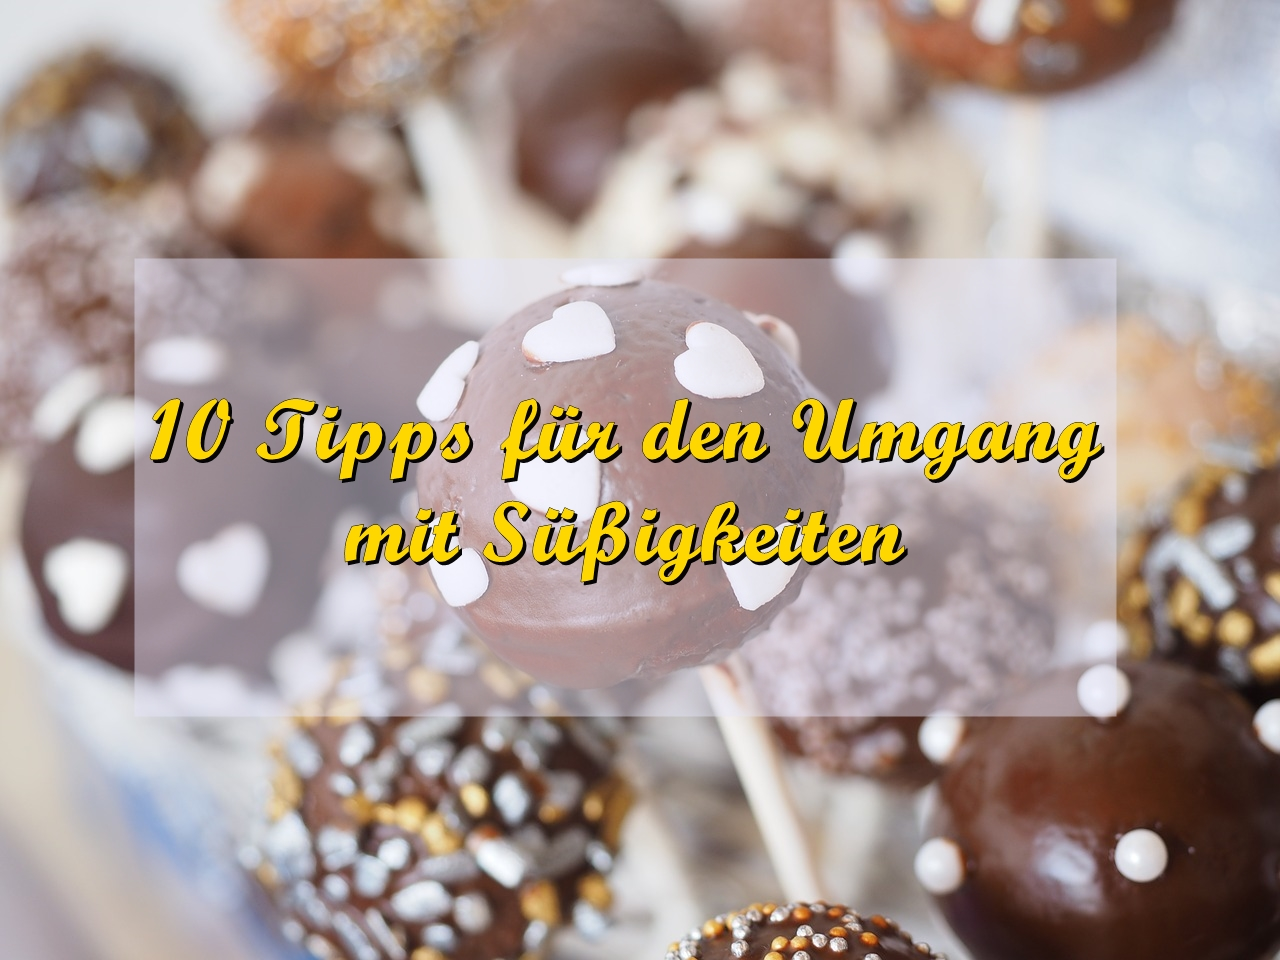 cake-pops-693662_1280